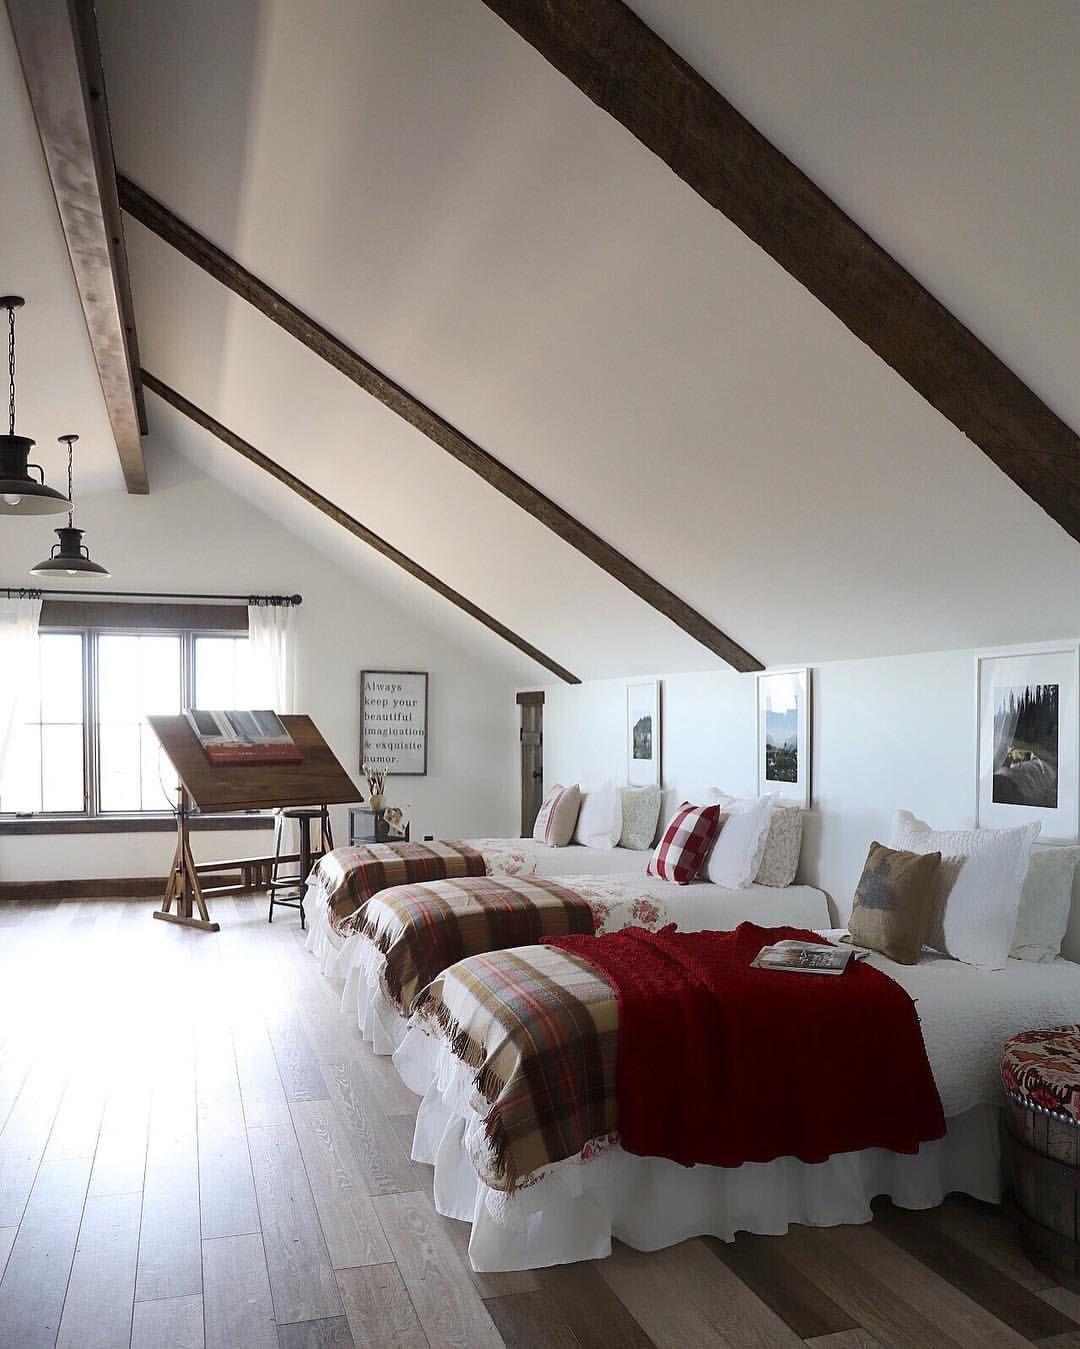 16 Astonishing Attic Nook Ideas Small Attic Room Attic Rooms